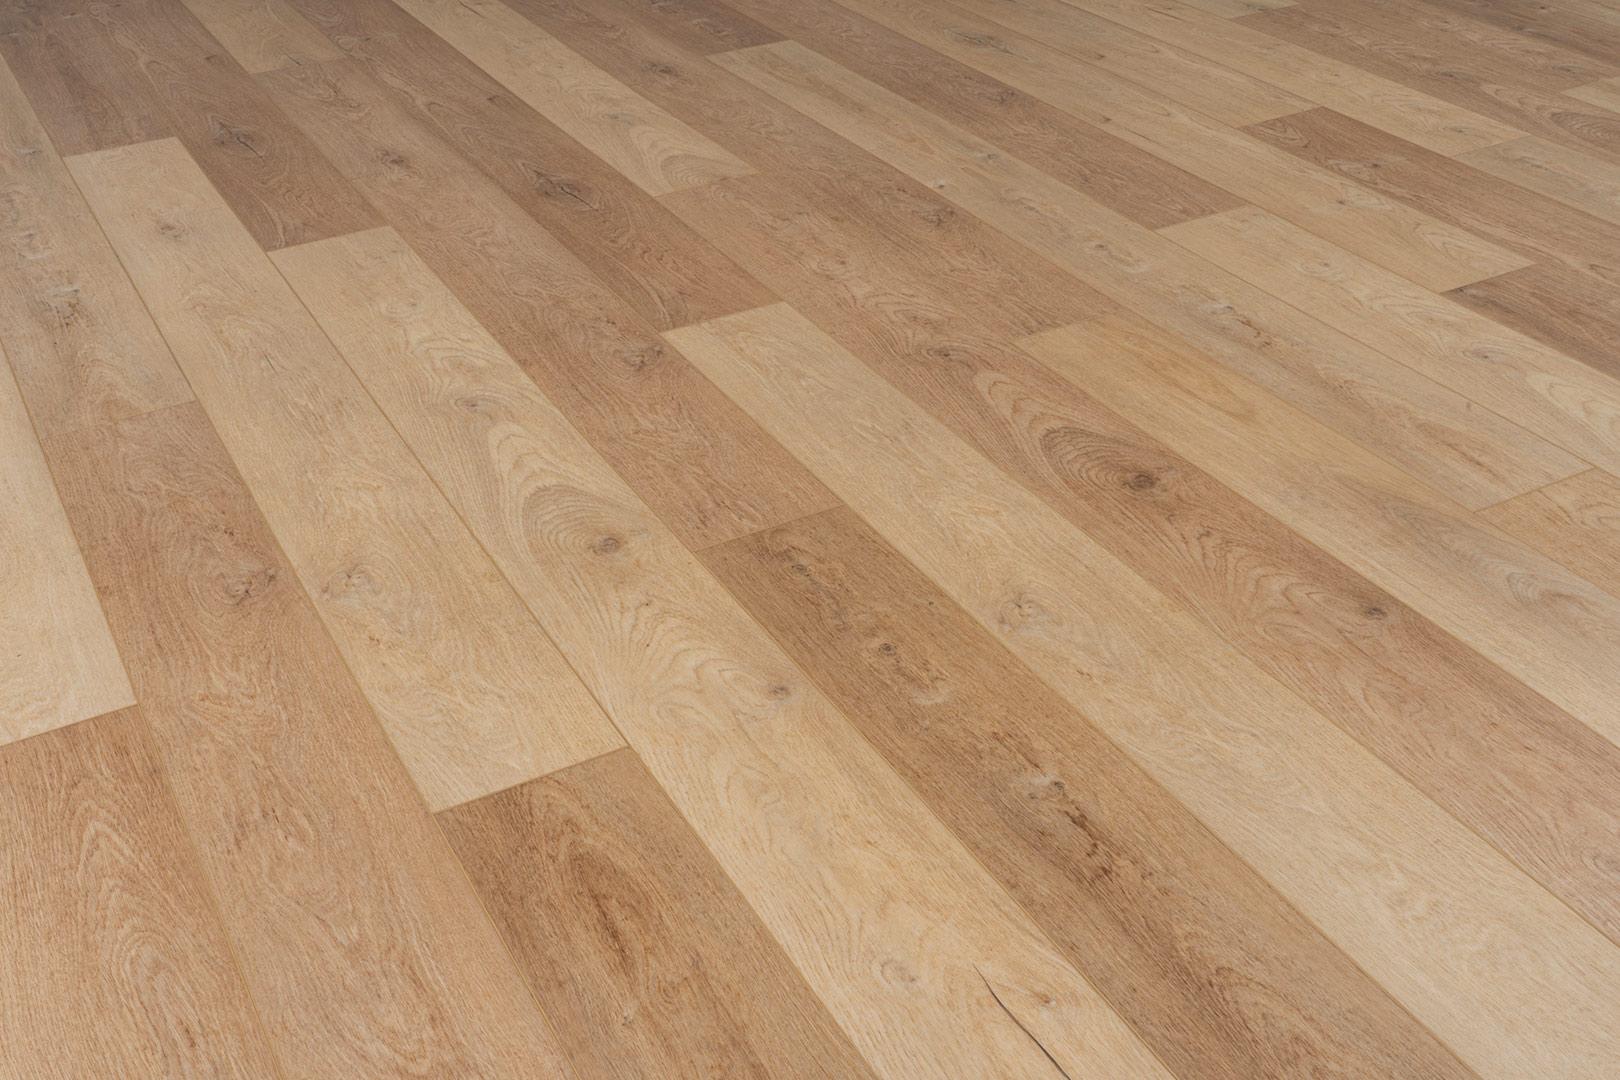 Provenza Moda Living Sweet Talker, Provenza Laminate Flooring Reviews